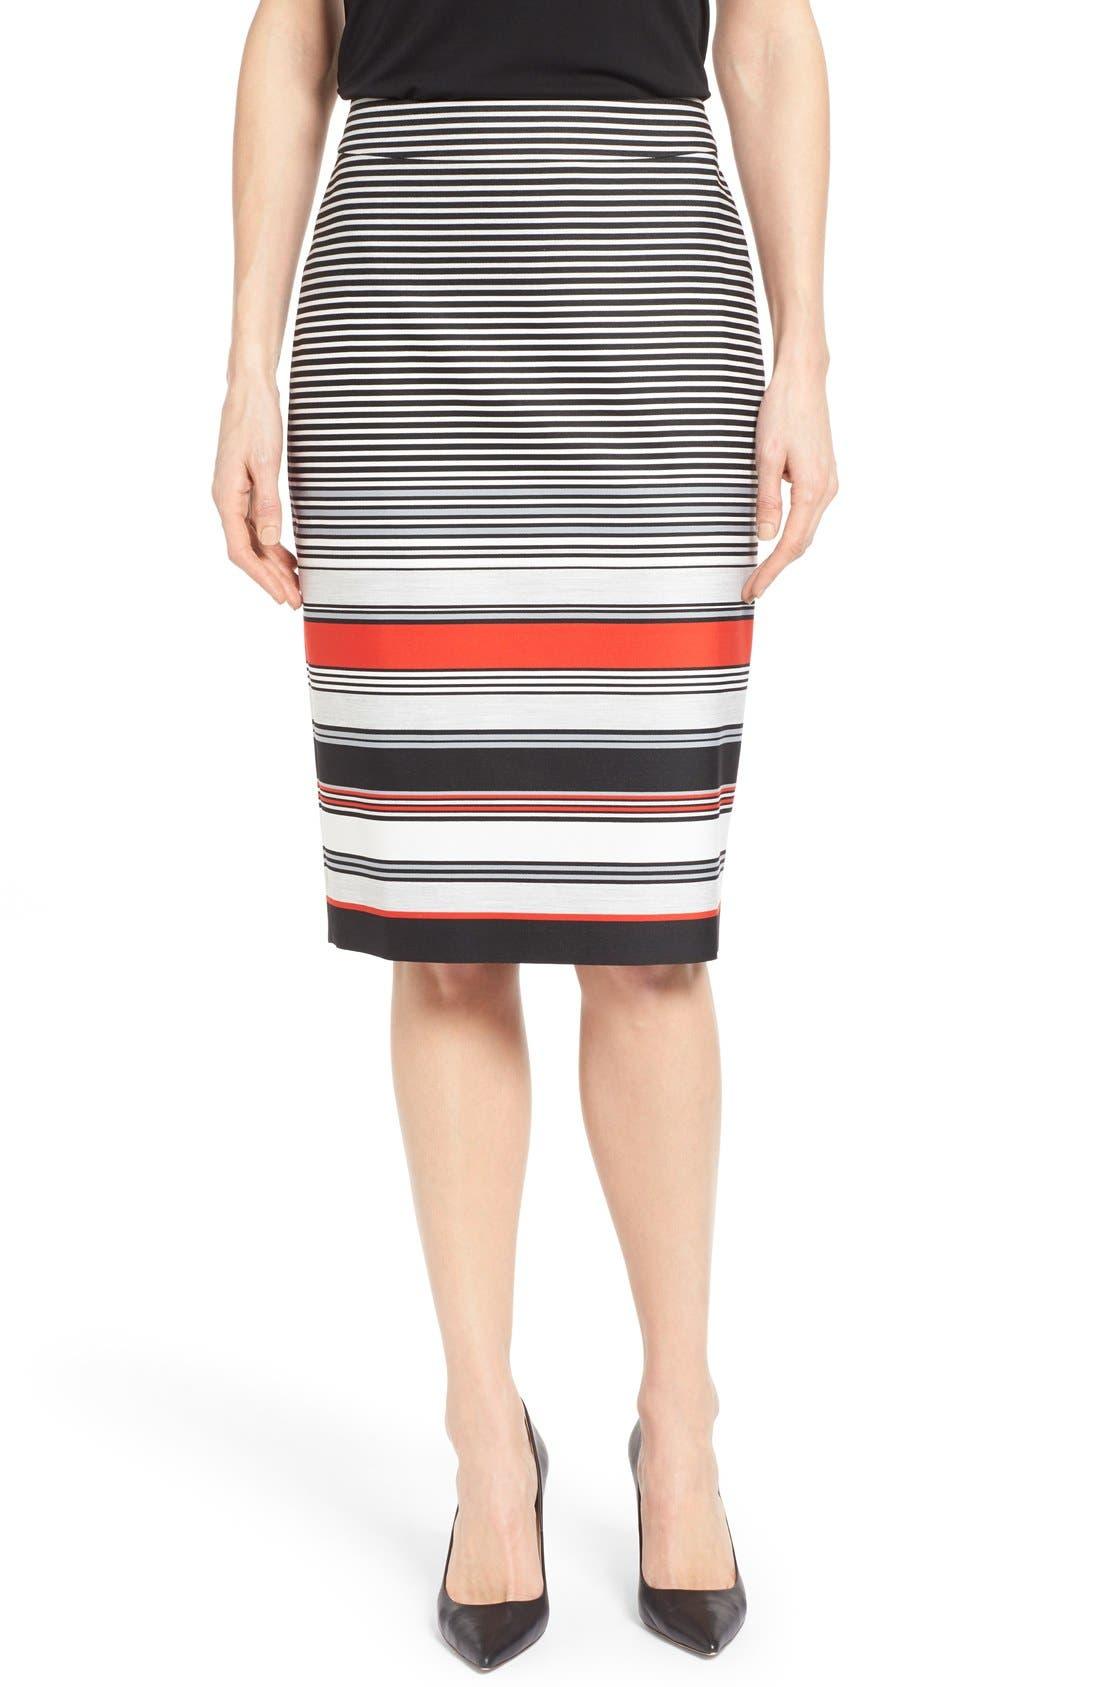 Alternate Image 1 Selected - Classiques Entier® 'Gallery Stripe' Pencil Skirt (Regular & Petite)